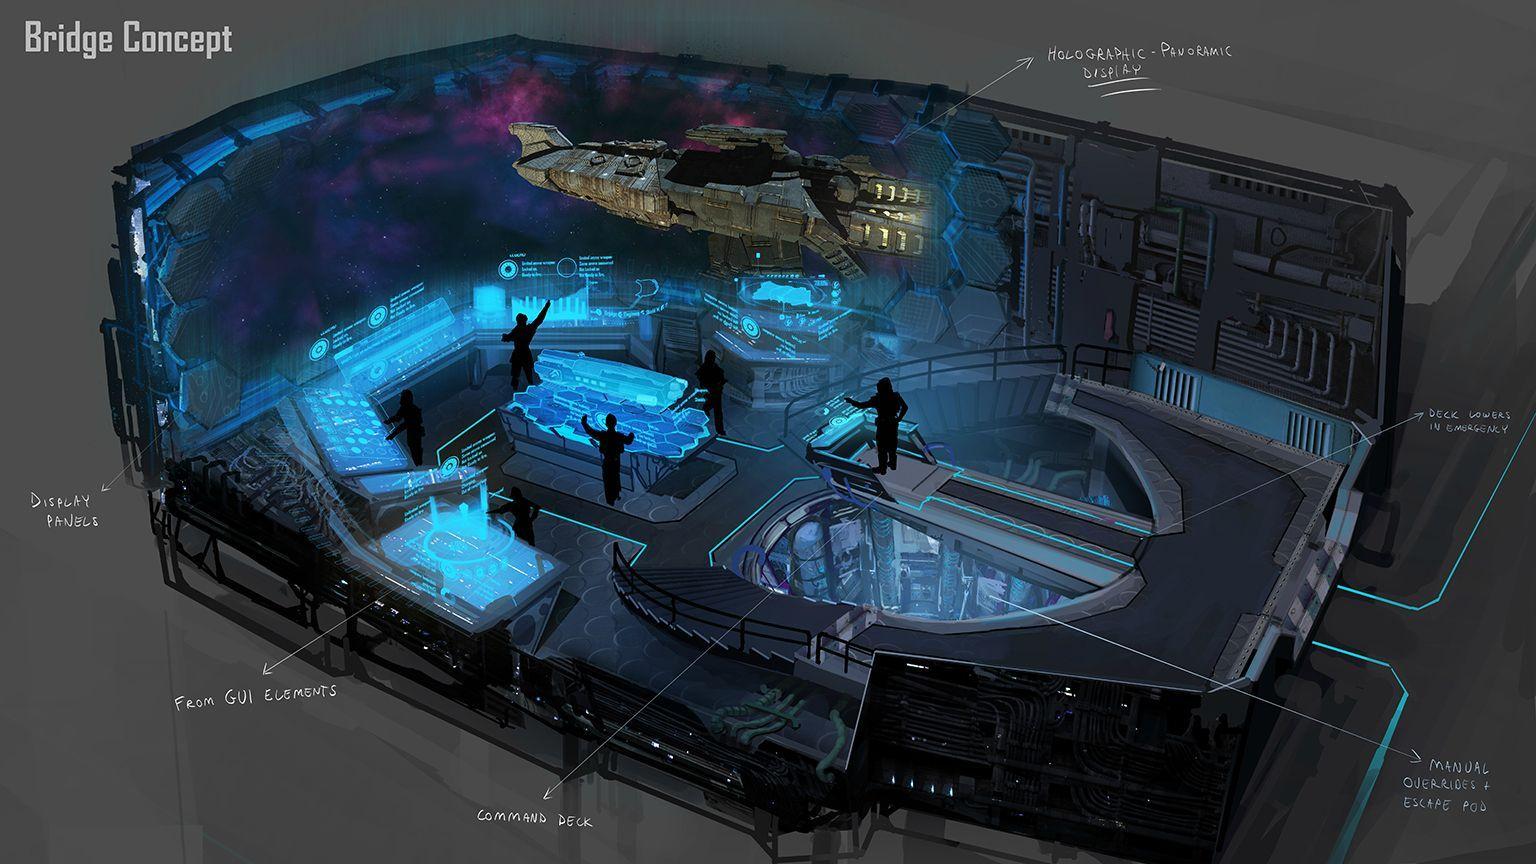 Battlesatr Galactica Bridge Concept Battlestar Galactica